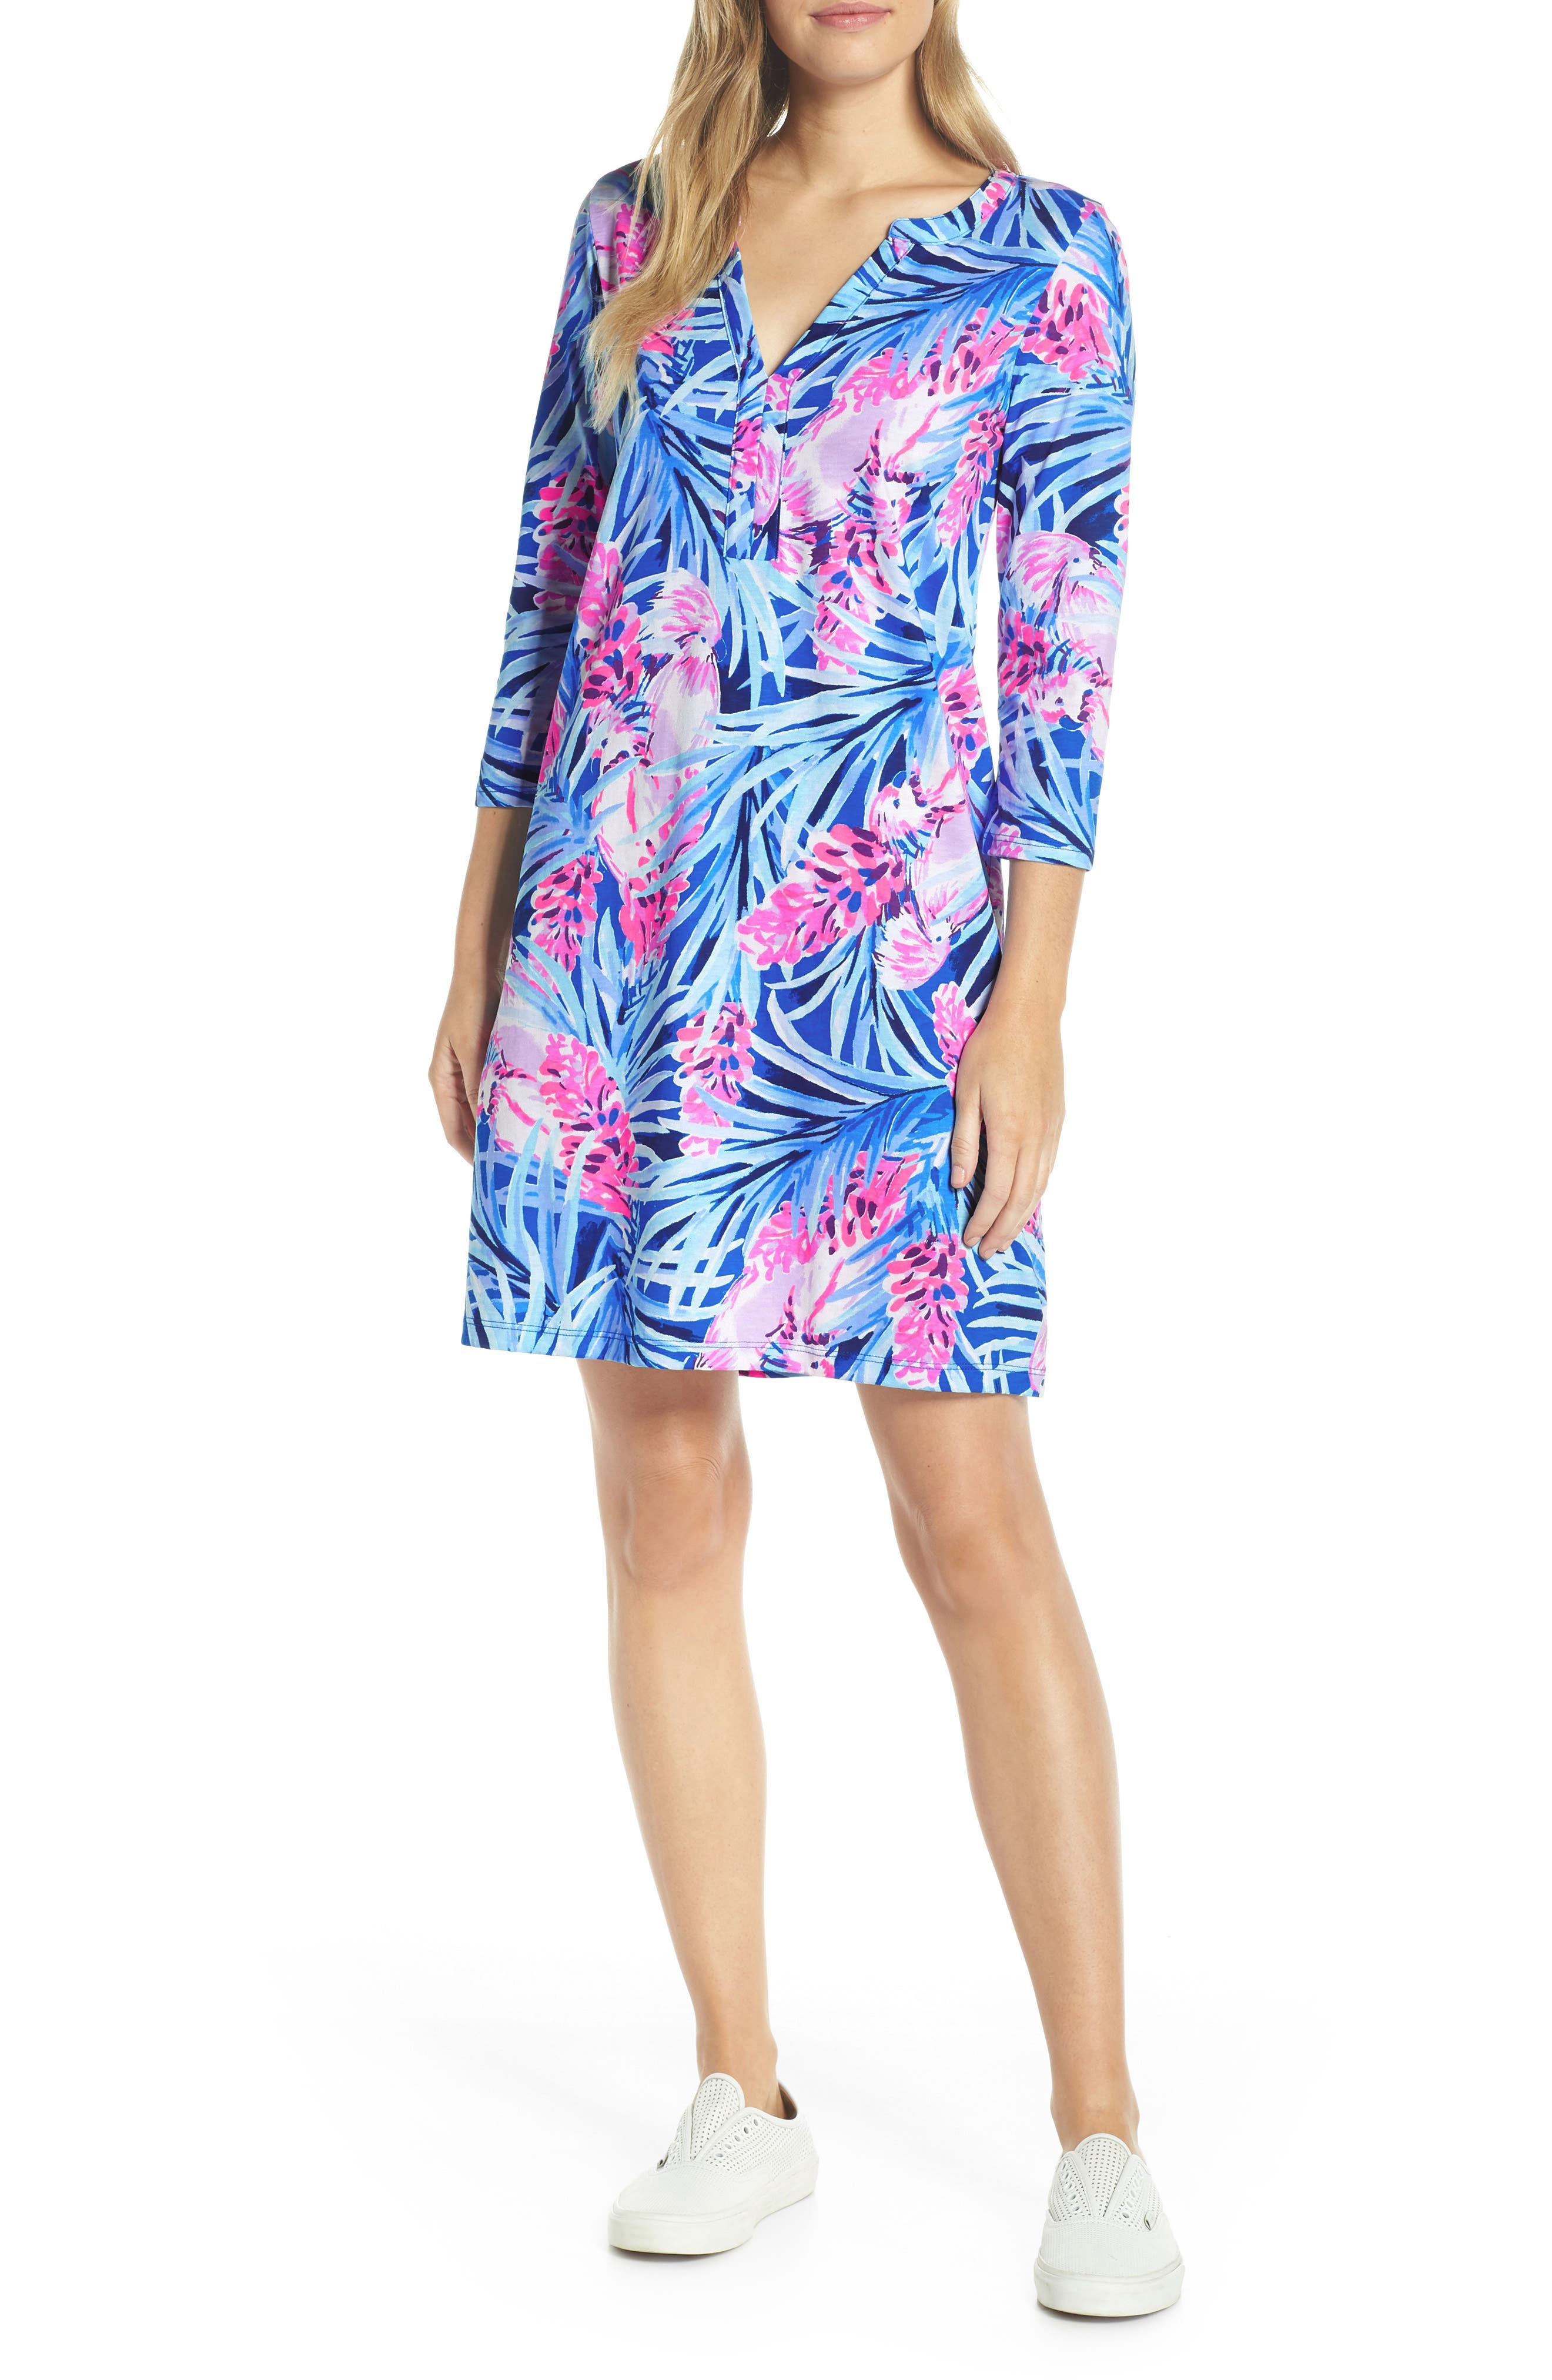 Lilly Pulitzer Daphne Shift Dress, Blue